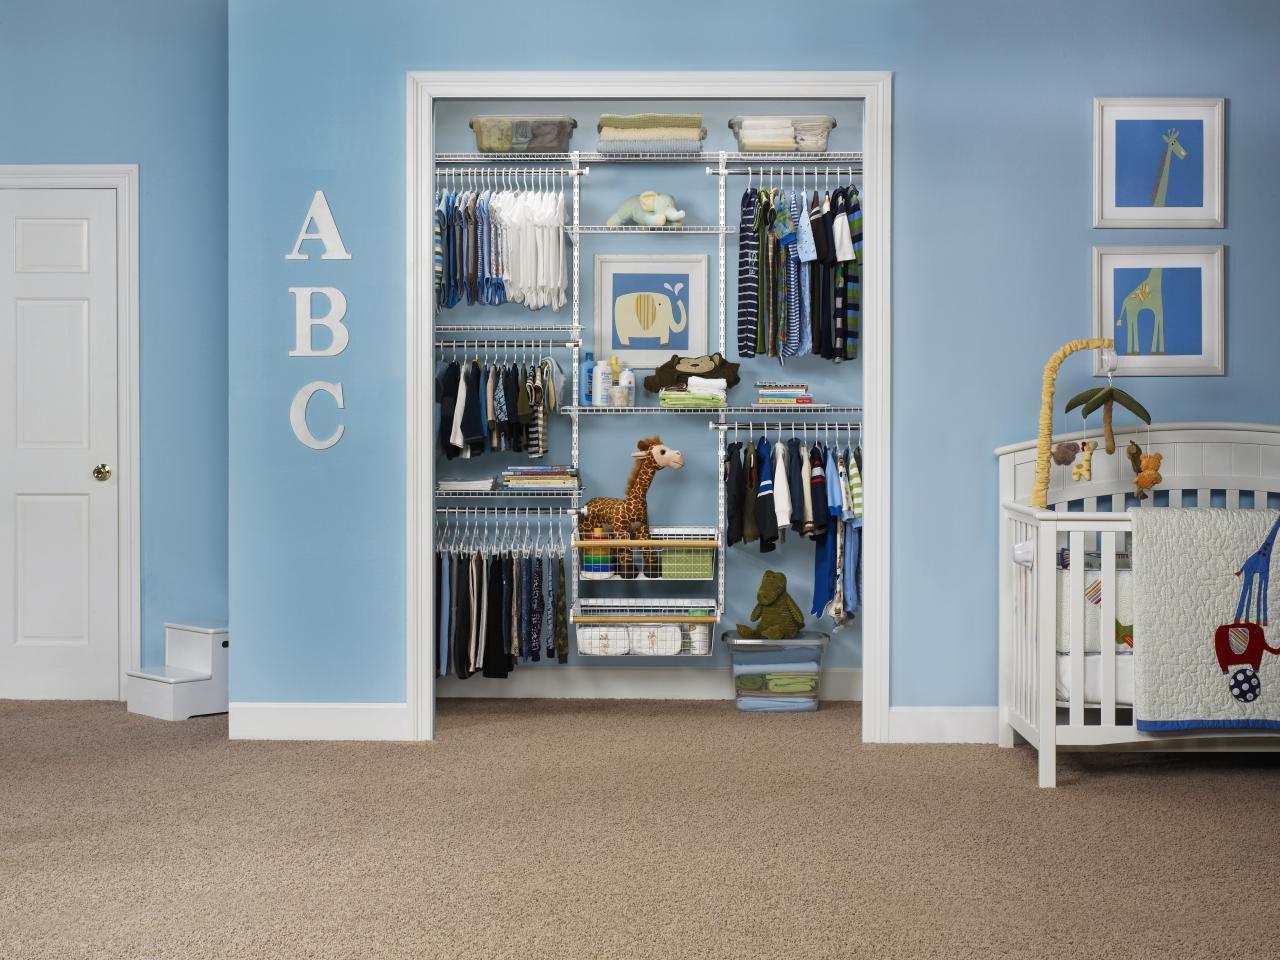 CI-Rubbermaid_white-baby-boy-reach-closet_s4x3.jpg.rend.hgtvcom.1280.960